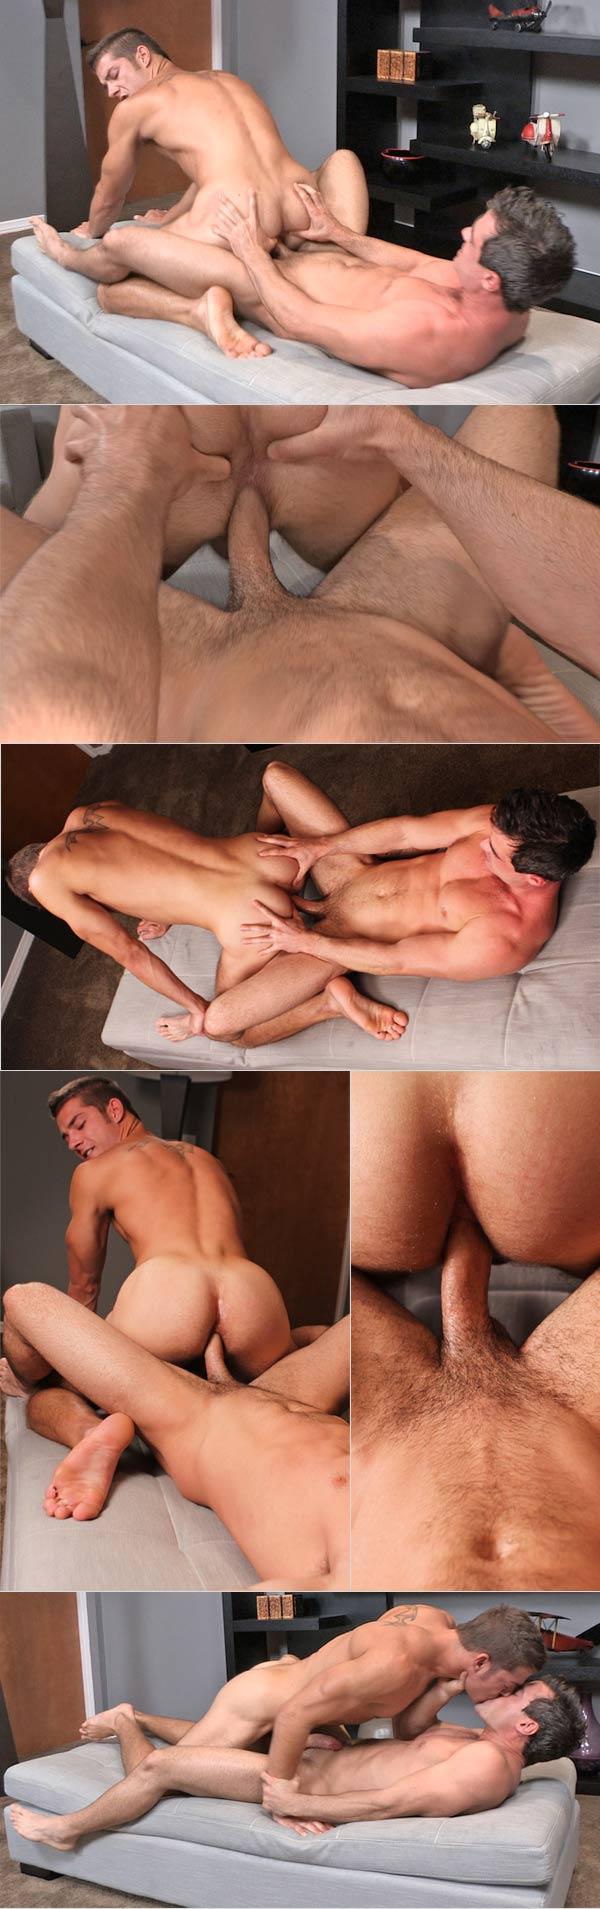 Aidan & Daniel (Bareback) at SeanCody